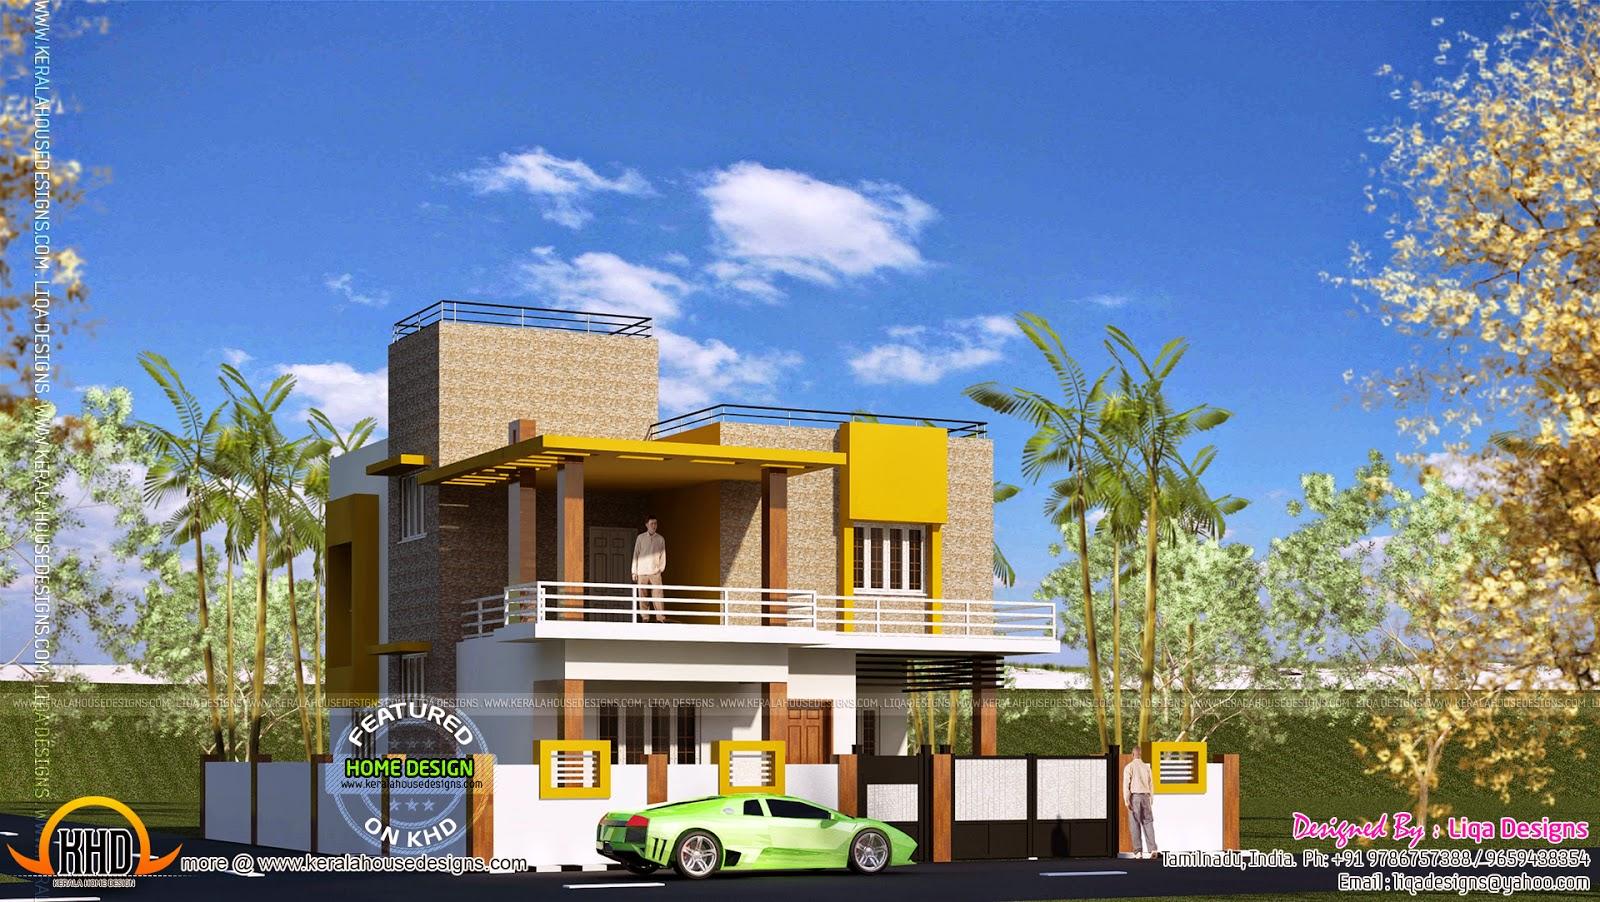 South indian home elevation designs joy studio design for South indian home designs and plans